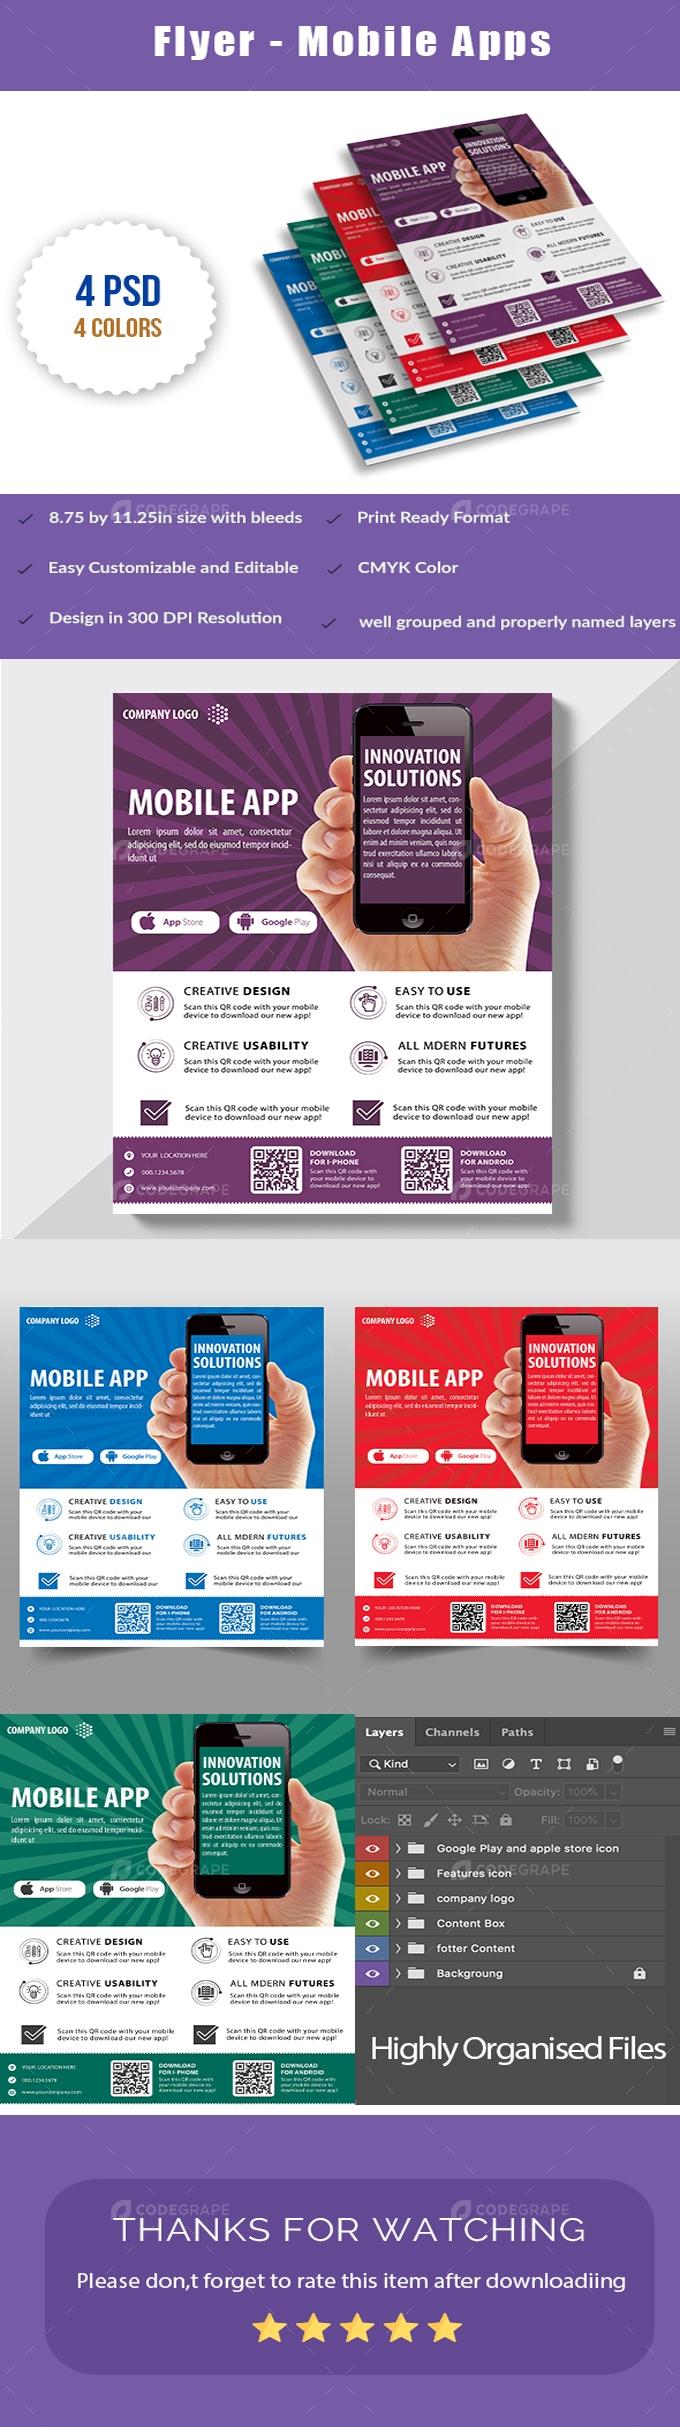 MobileApp Flyer option